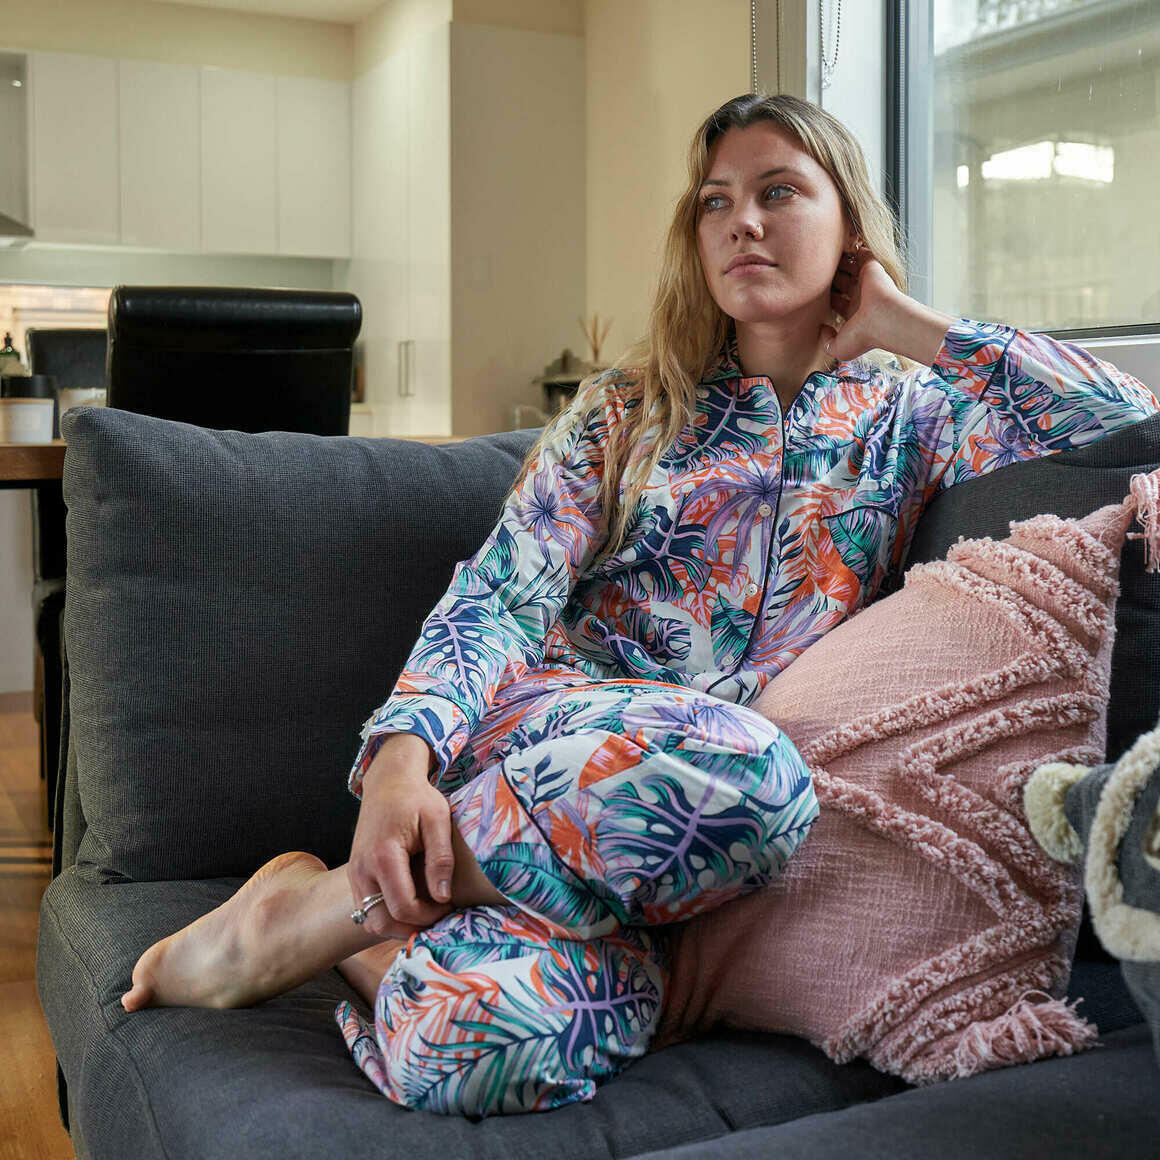 FLORAL PJ SET, Includes 4 sizes S,M,L,XL Personalized Pajamas, Bridal Party Pajamas, Bridesmaid PJs, Maid of Honor, Lounge wear, Sleepwear | Trada Marketplace